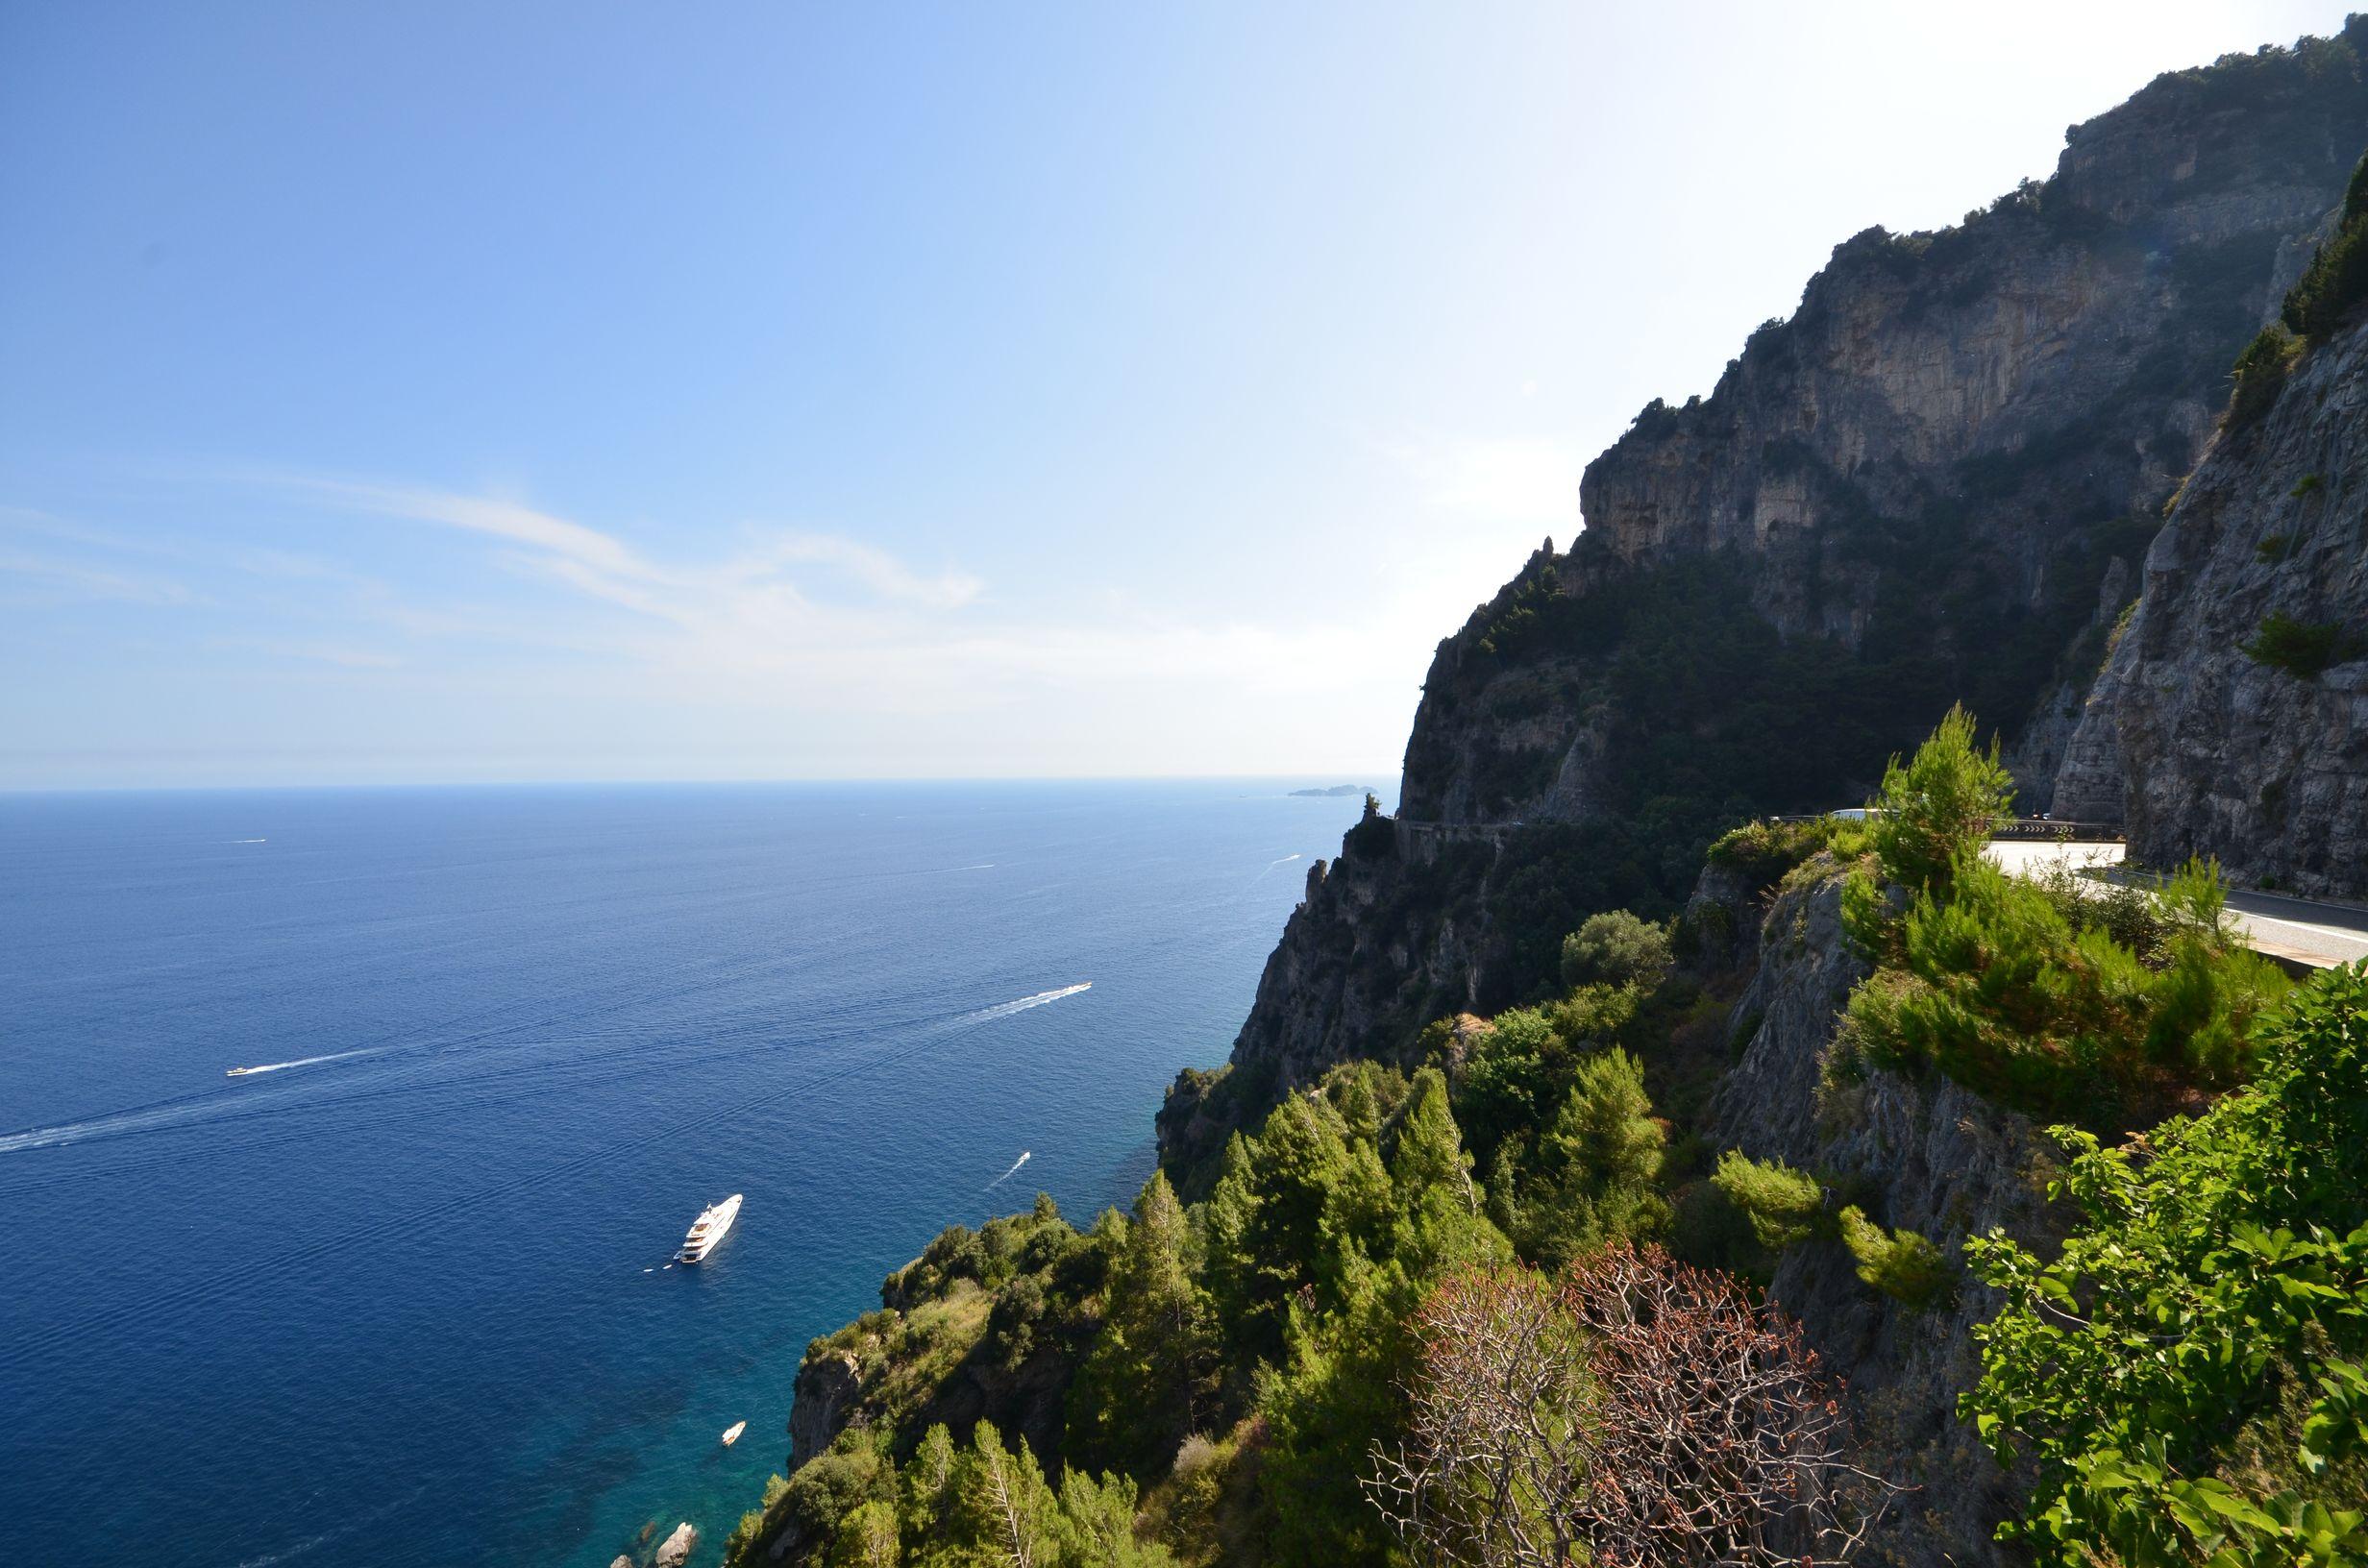 Tour d'Europe, Italie, Cote amalfitaine